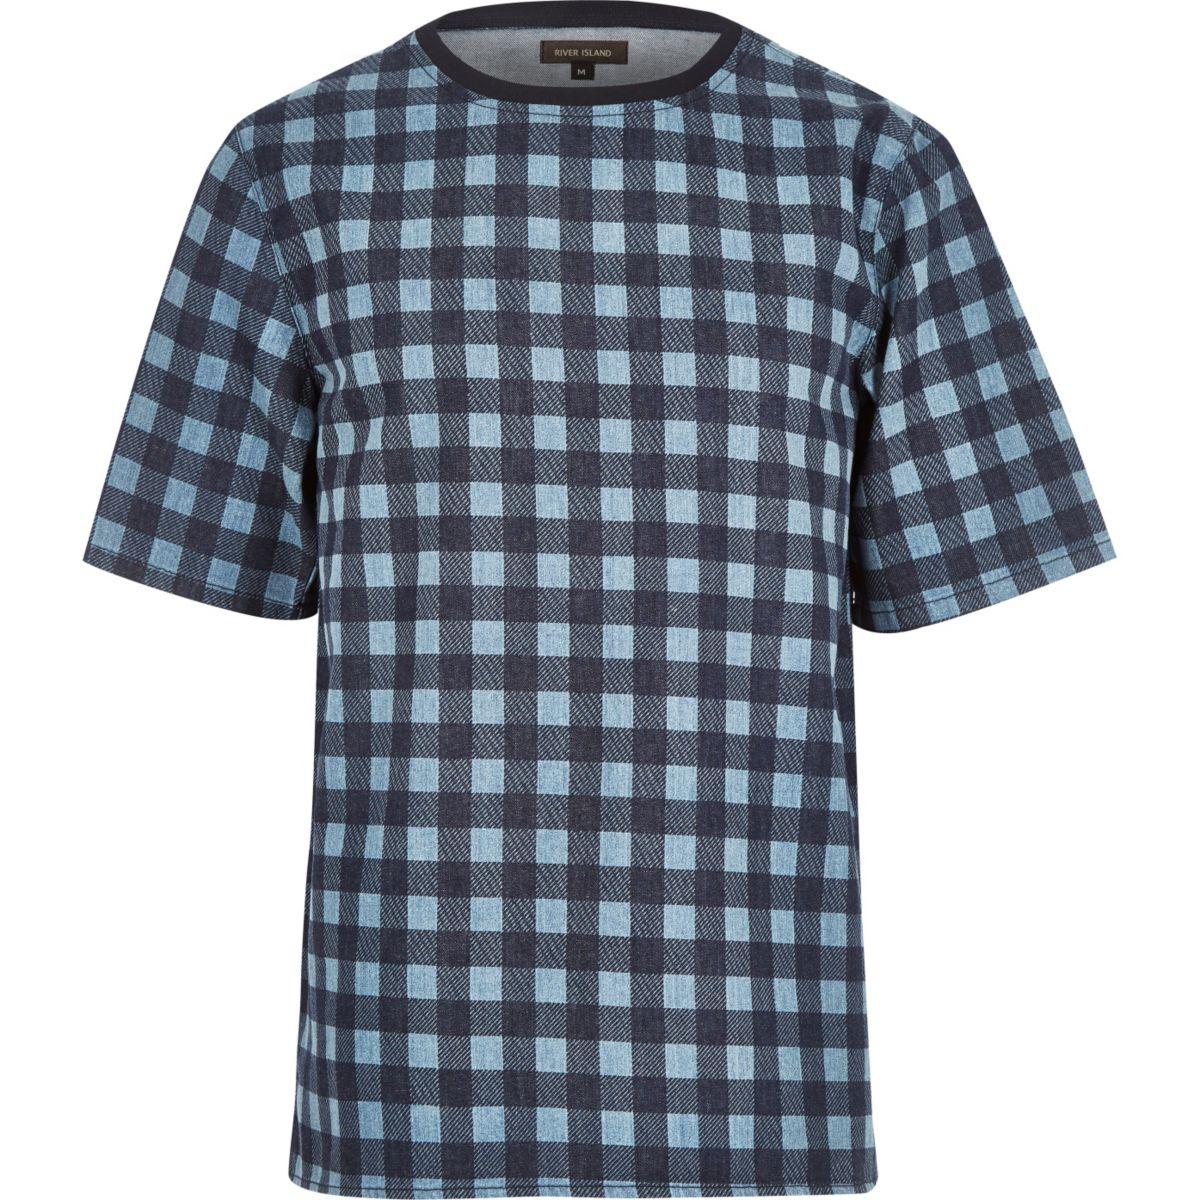 Blue check short sleeve t-shirt